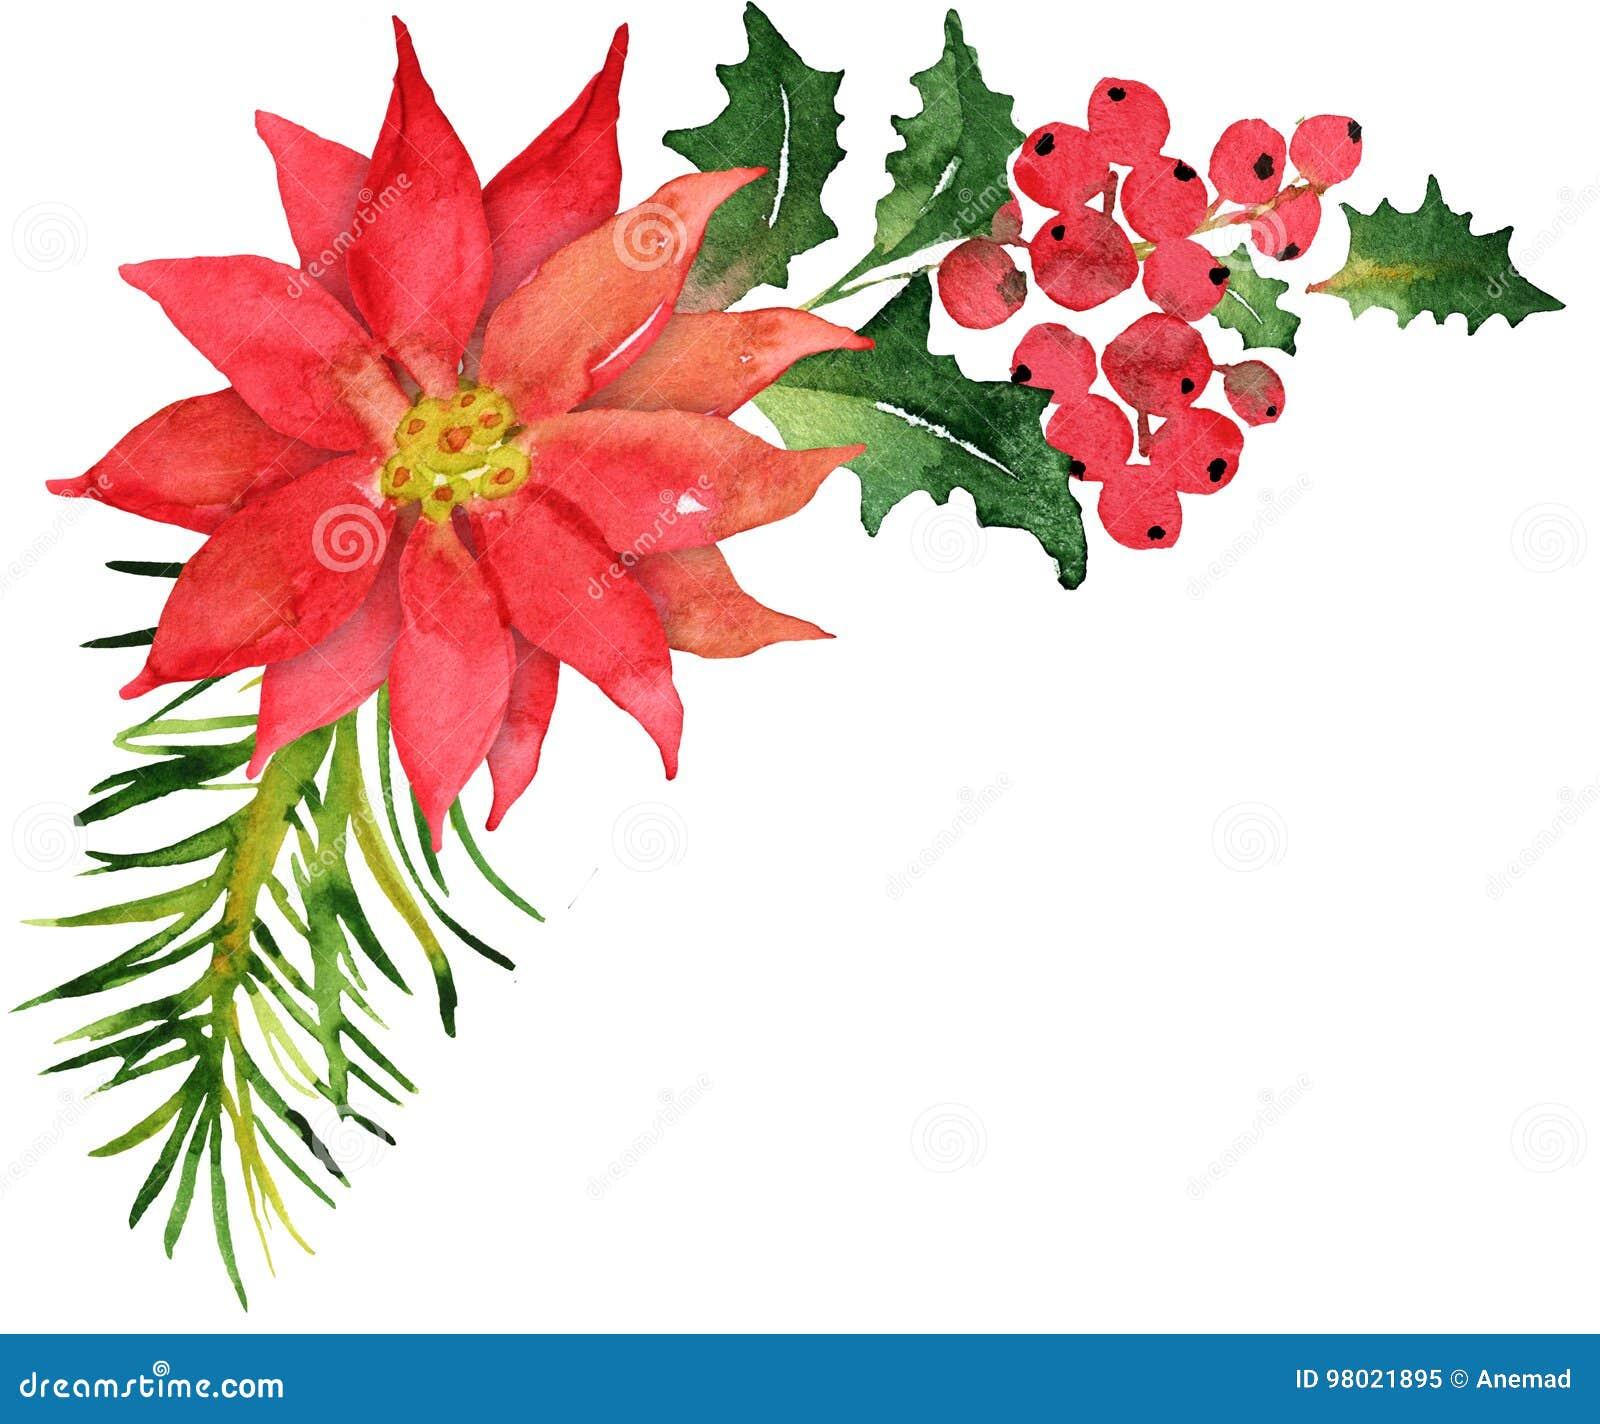 Poinsettia Template | Christmas Bouquet With Poinsettia Stock Illustration Illustration